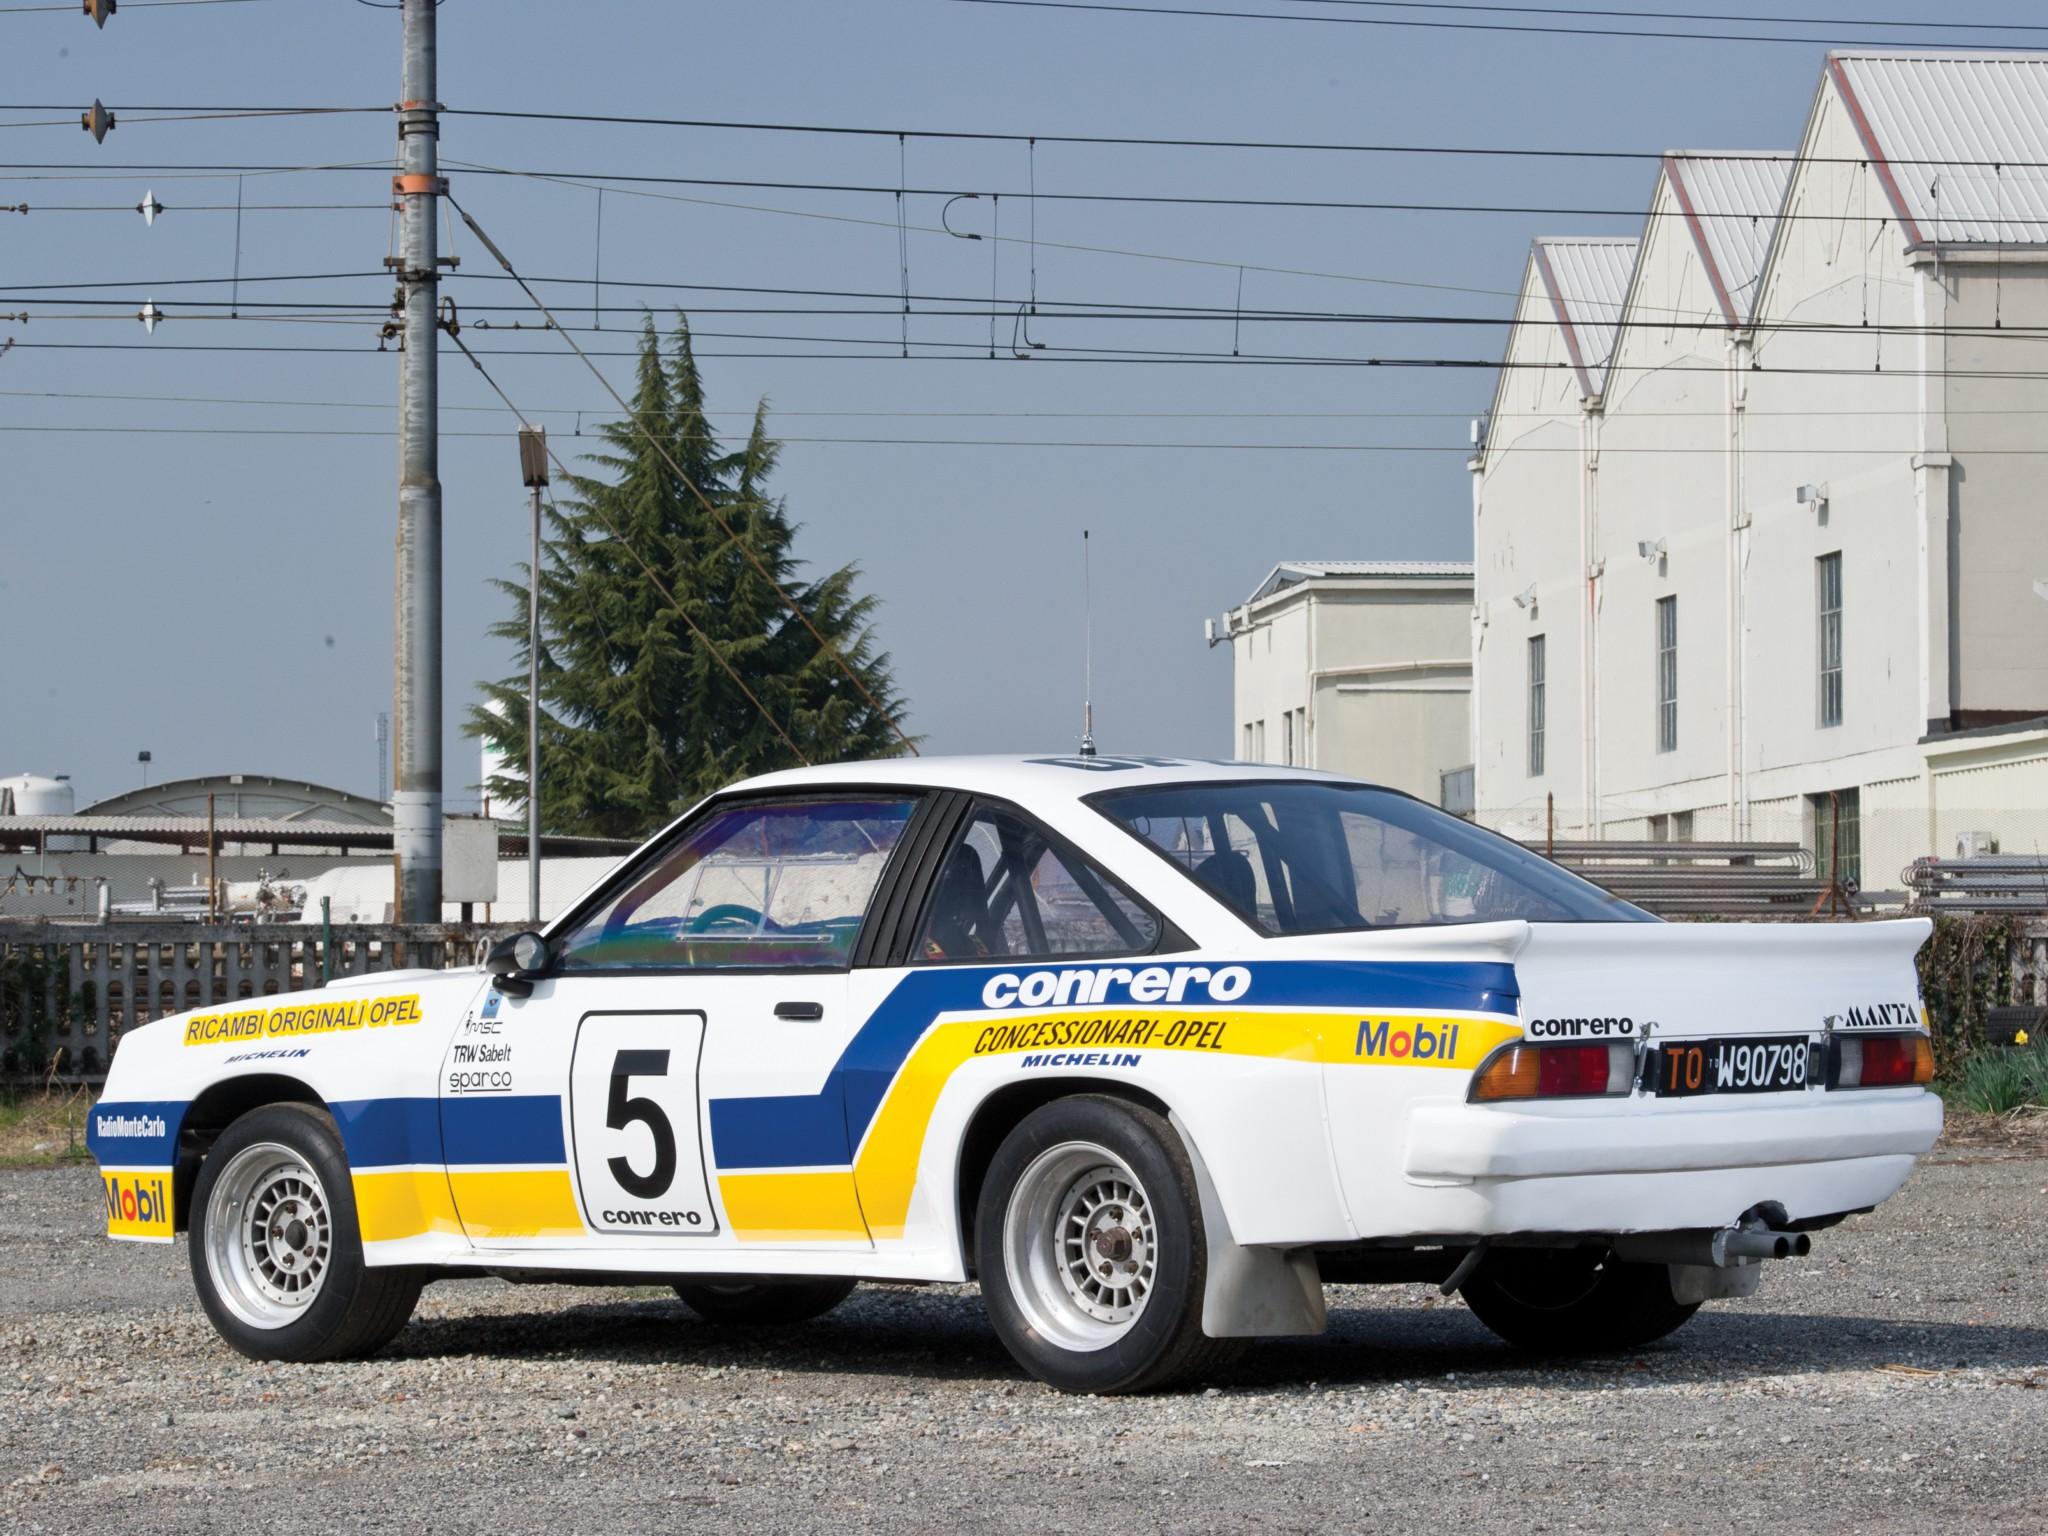 1981 Opel Manta 400 Group B Rally race racing h wallpaper background 2048x1536